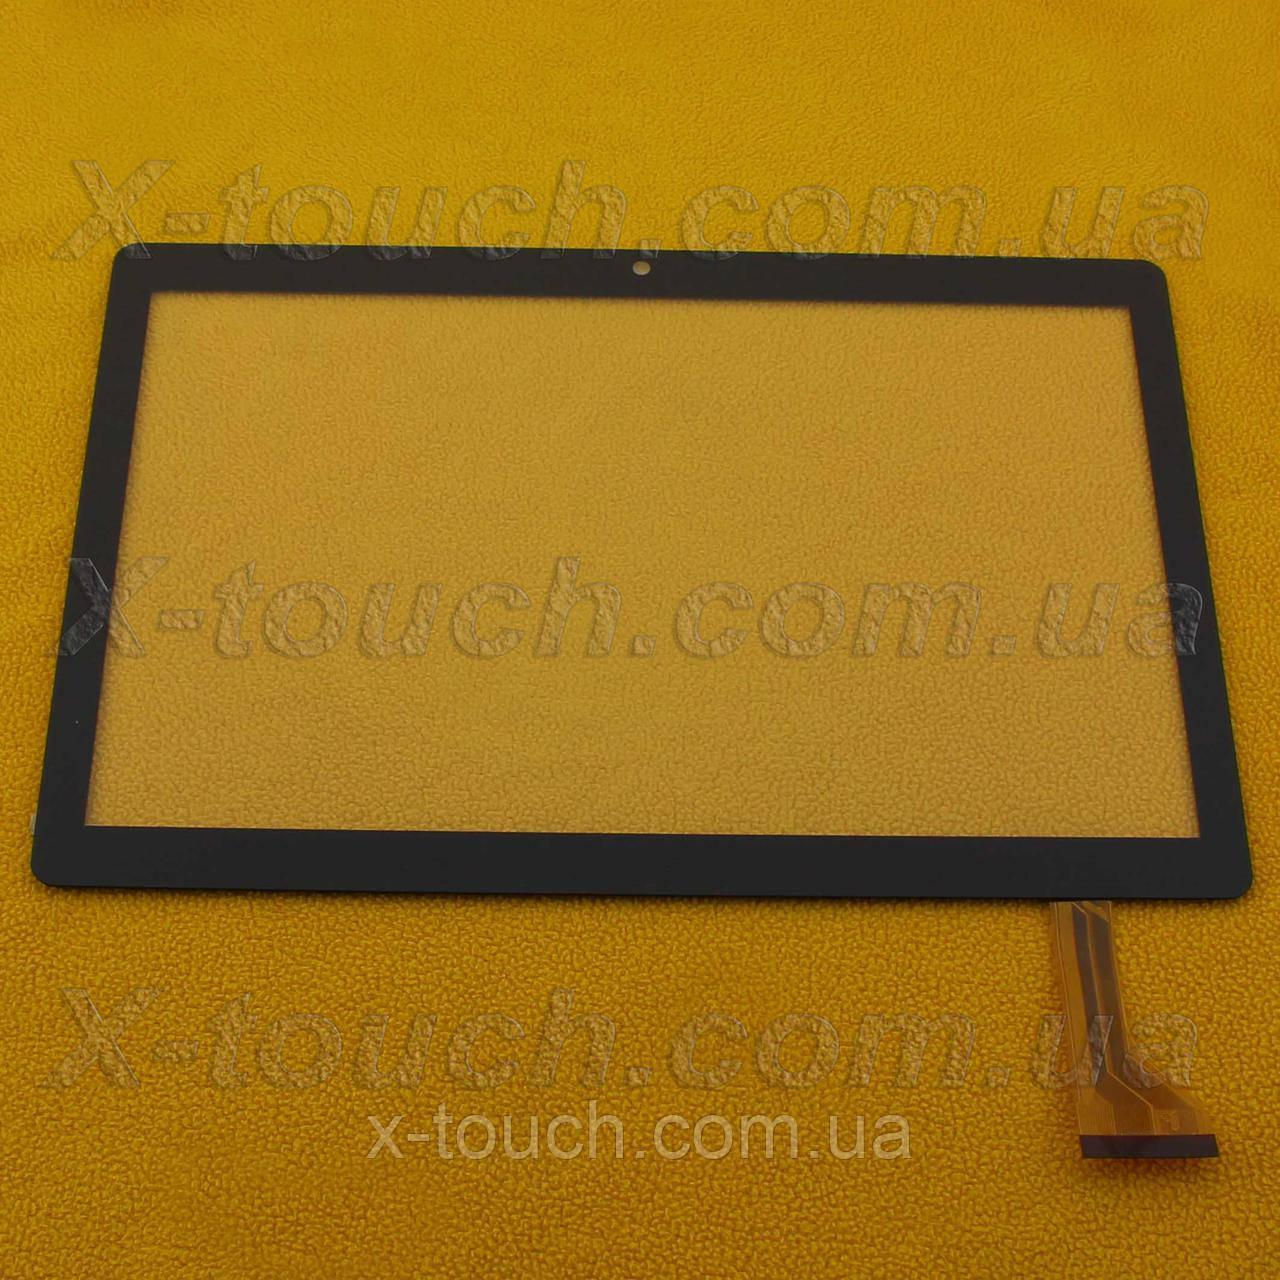 Cенсор, тачскрин MGLCTP-10927-10617 FPC, 10 дюймов, цвет черный 237х167.